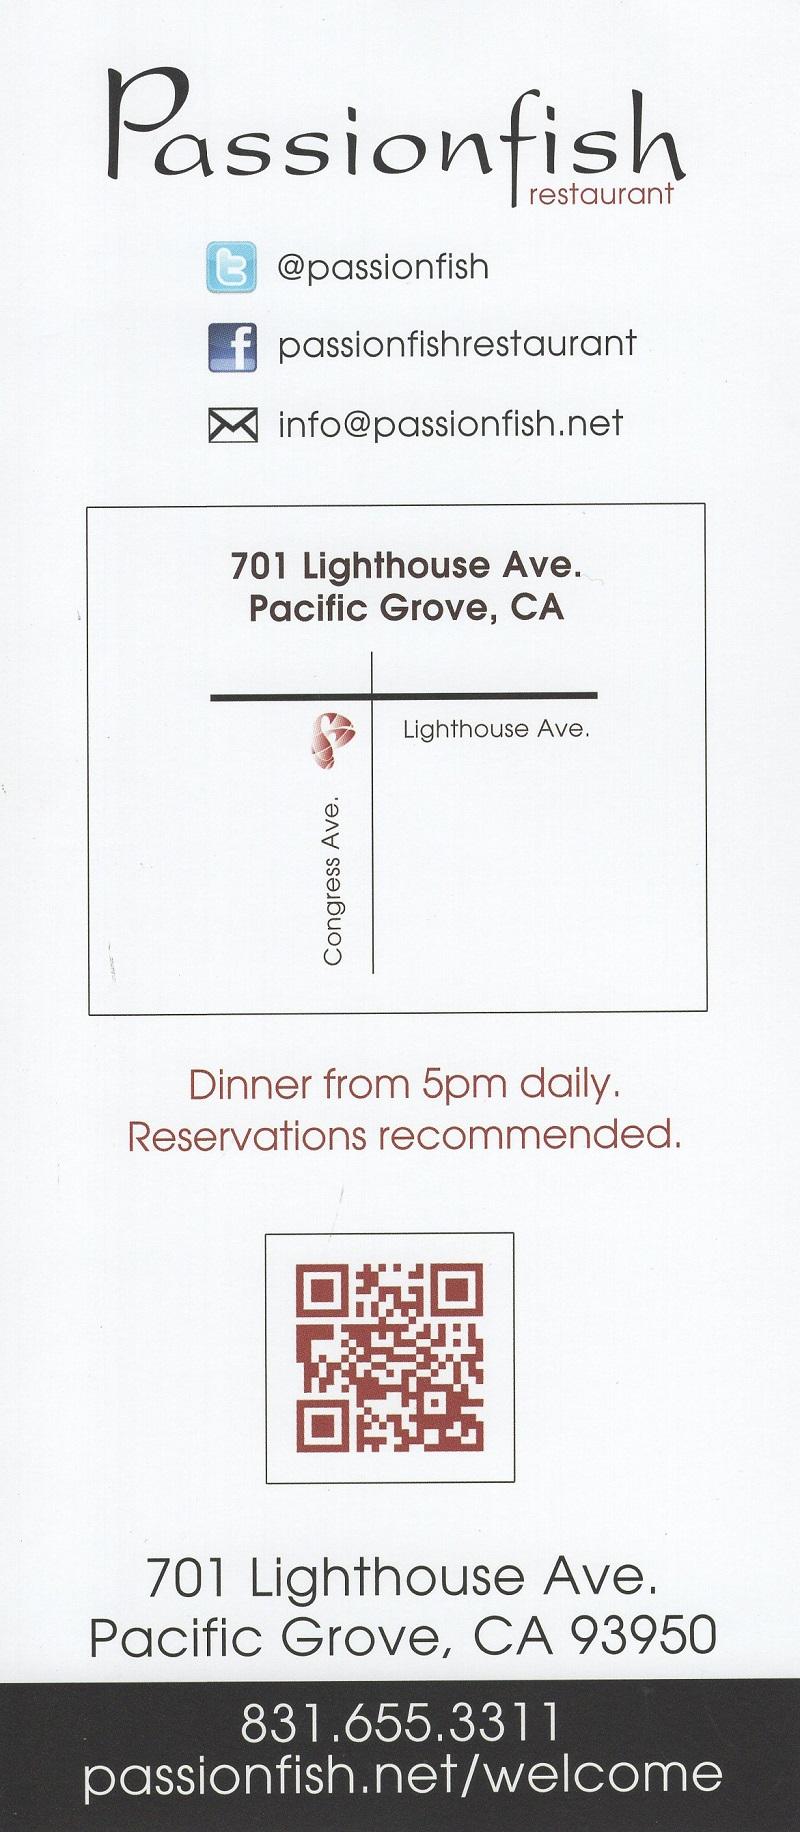 Passionfish Restaurant brochure thumbnail